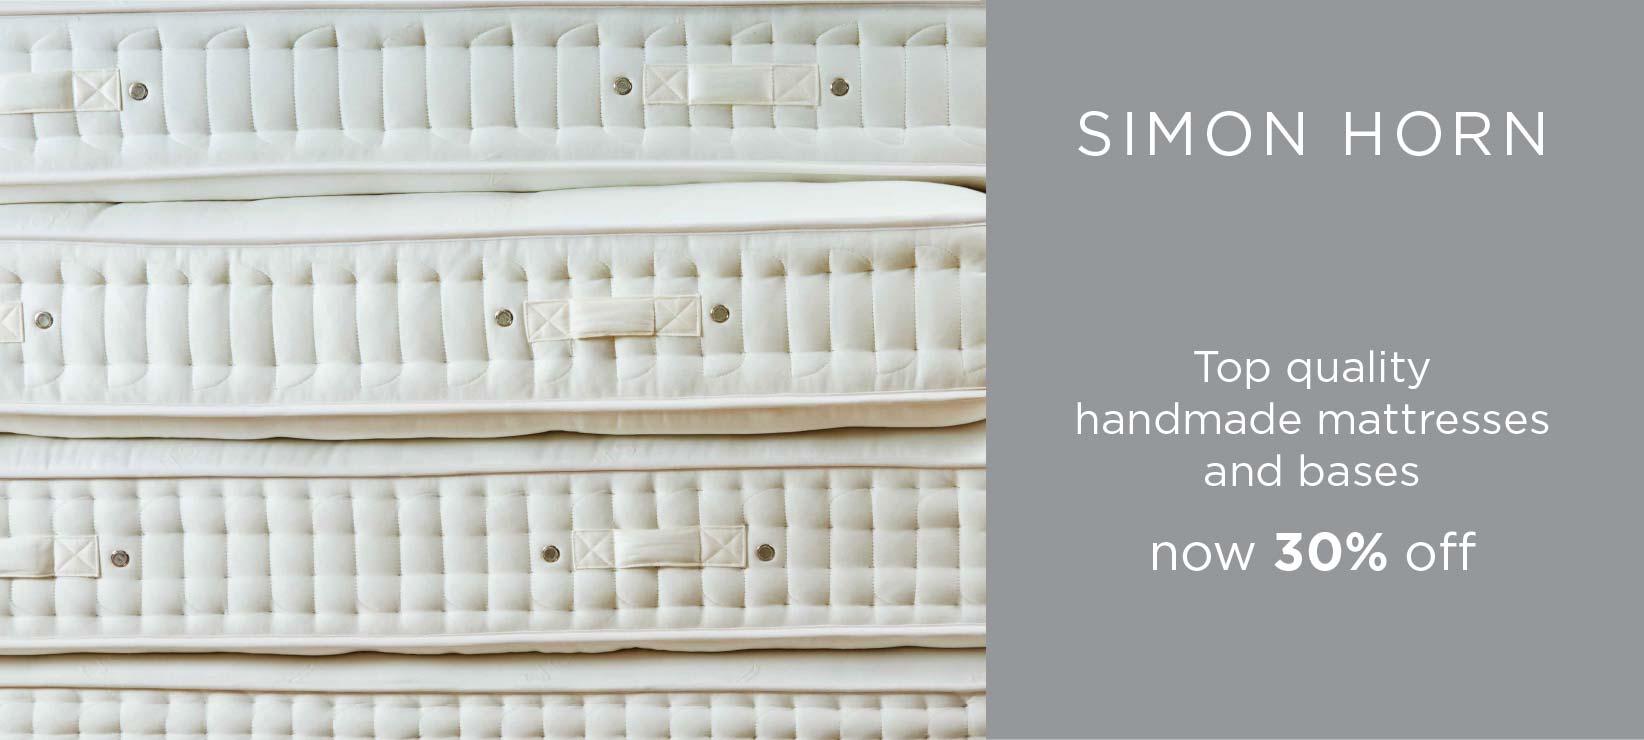 30% Off Top Quality Handmade Simon Horn Mattresses